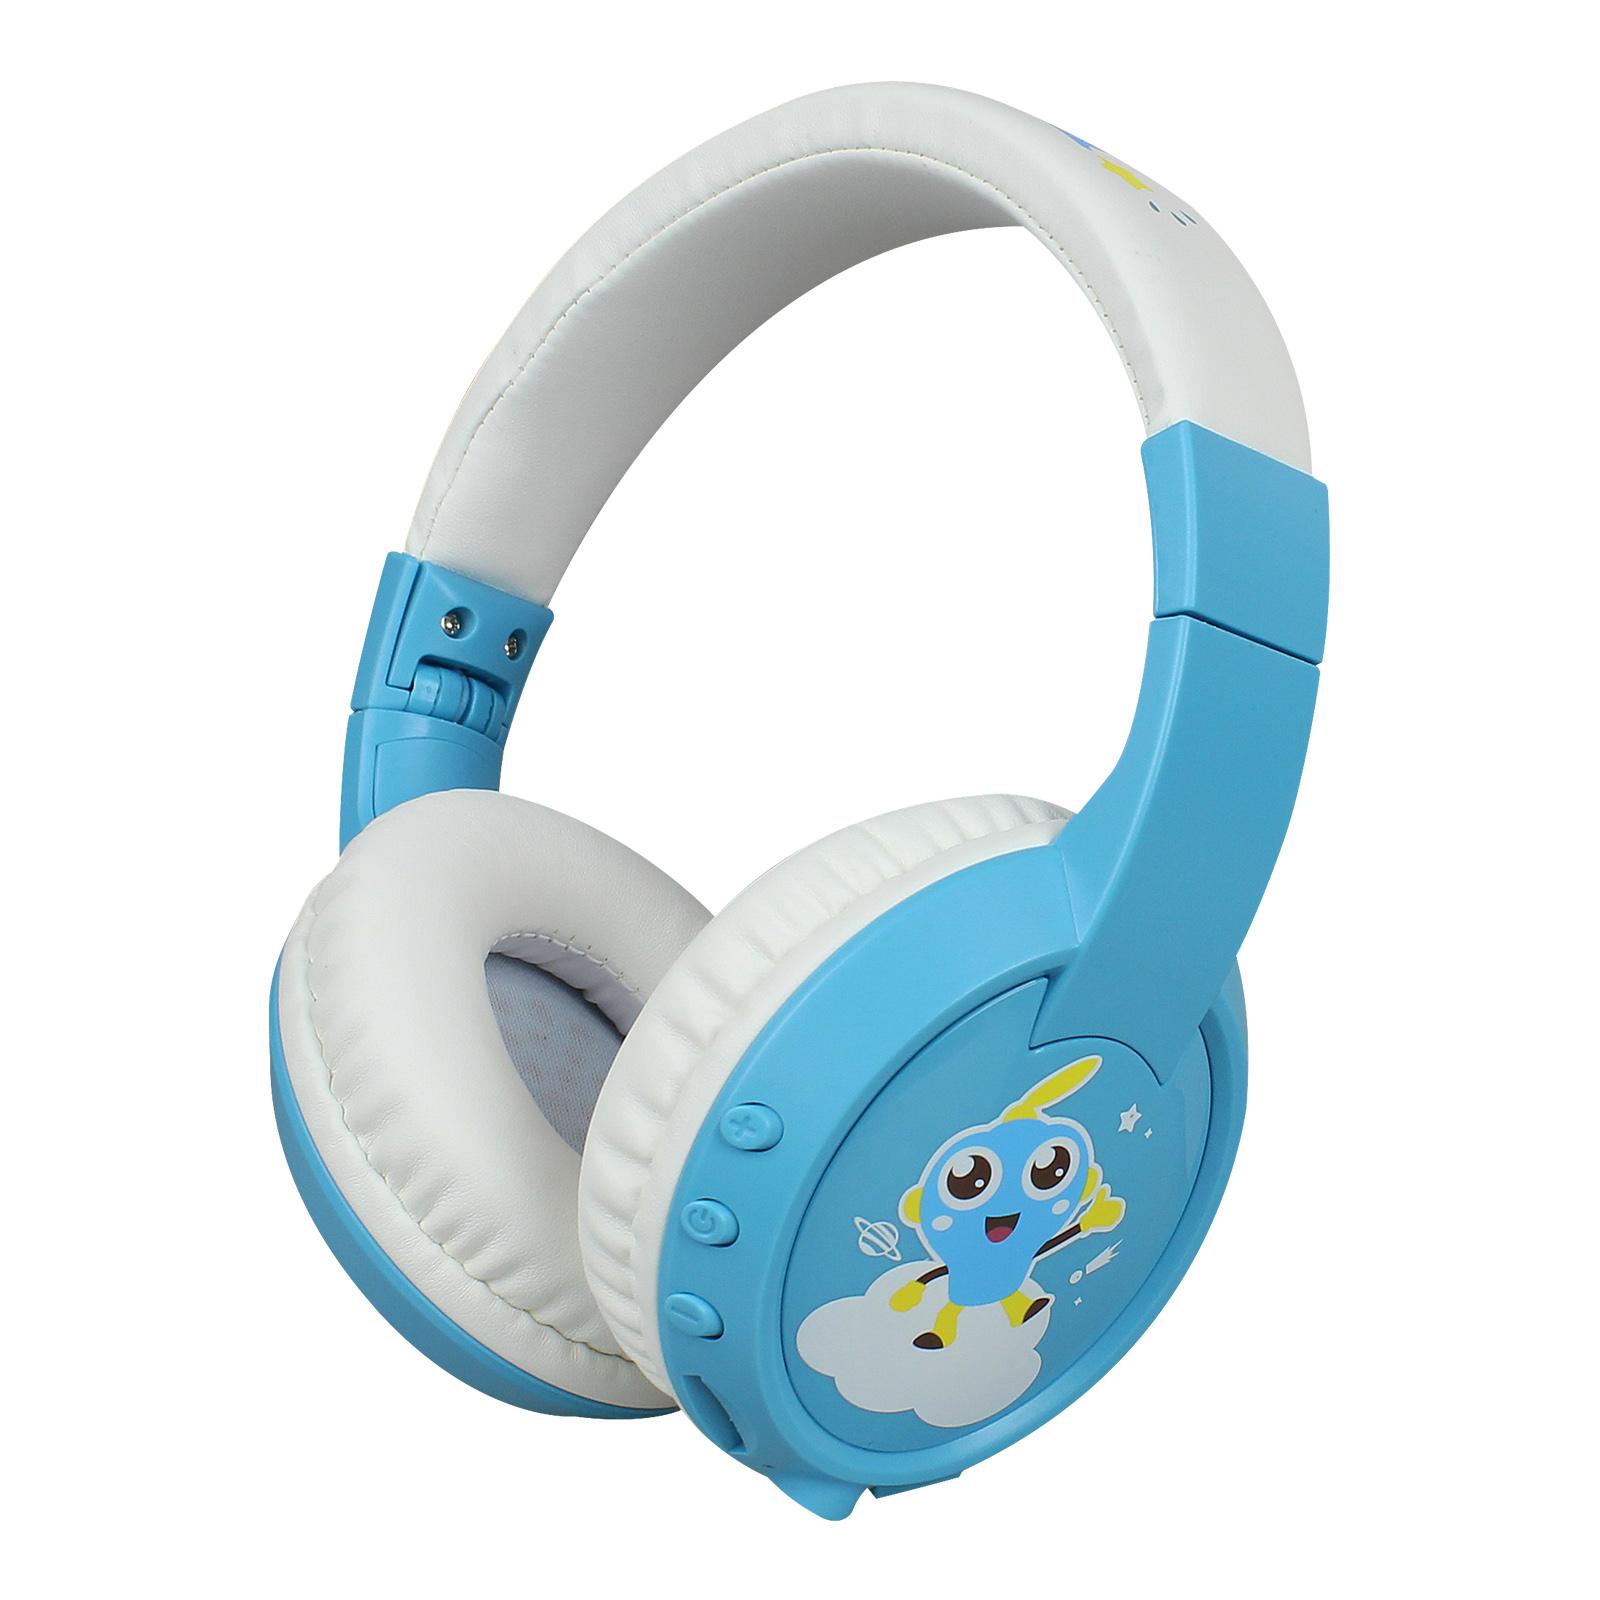 Children Bluetooth Headset BT5.0 Wireless Kids Headphone with HD Mic Support TF Card for Children Study/Entertainment blue